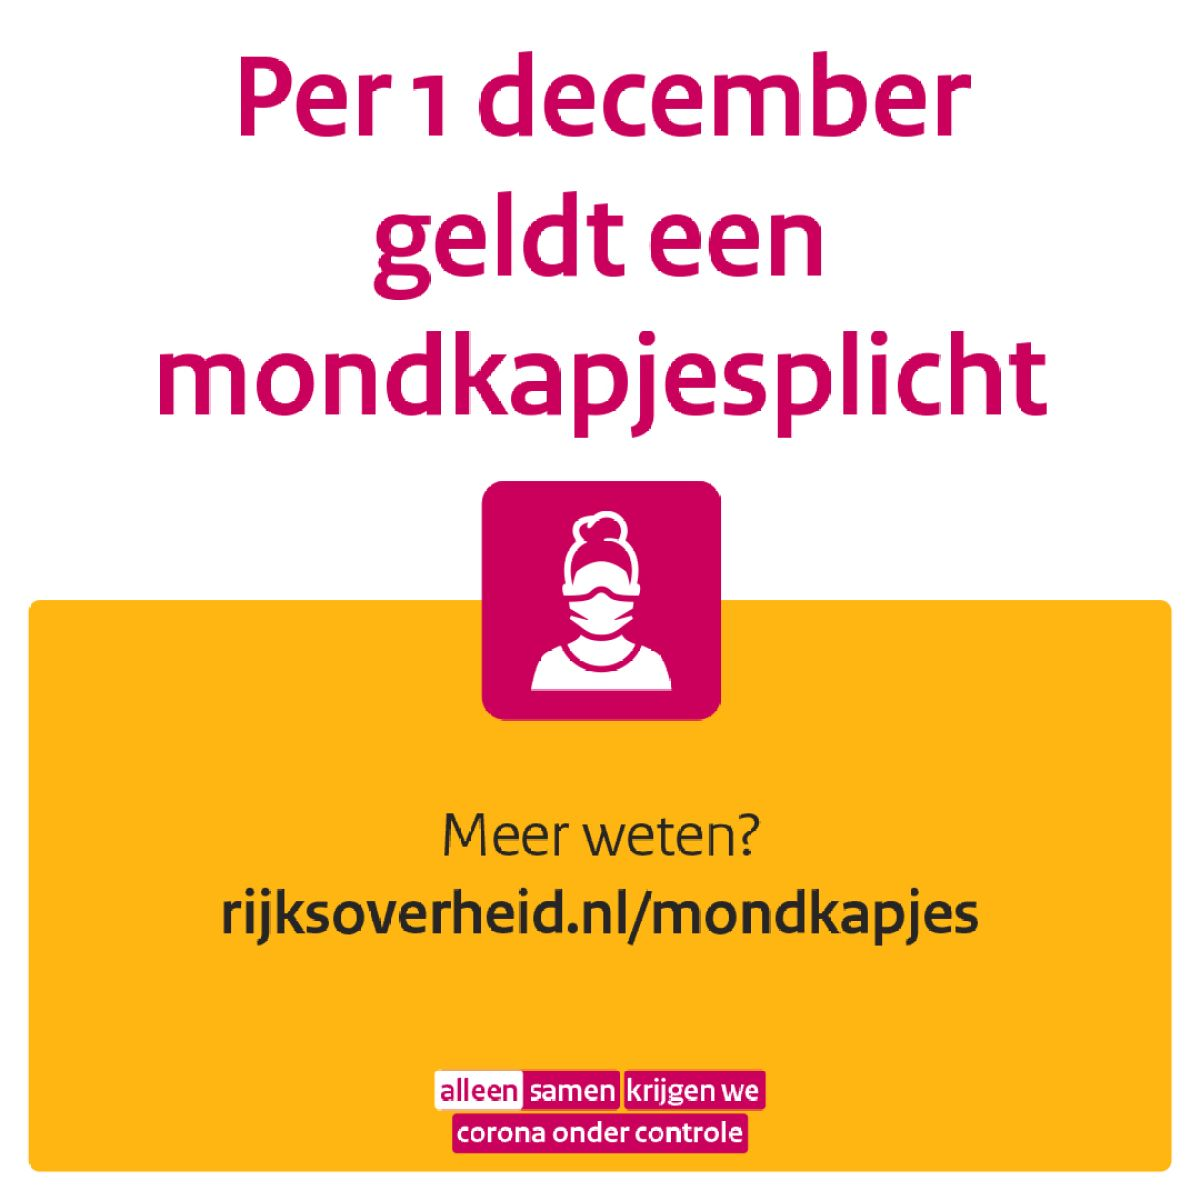 Per 1 december: mondkapjesplicht